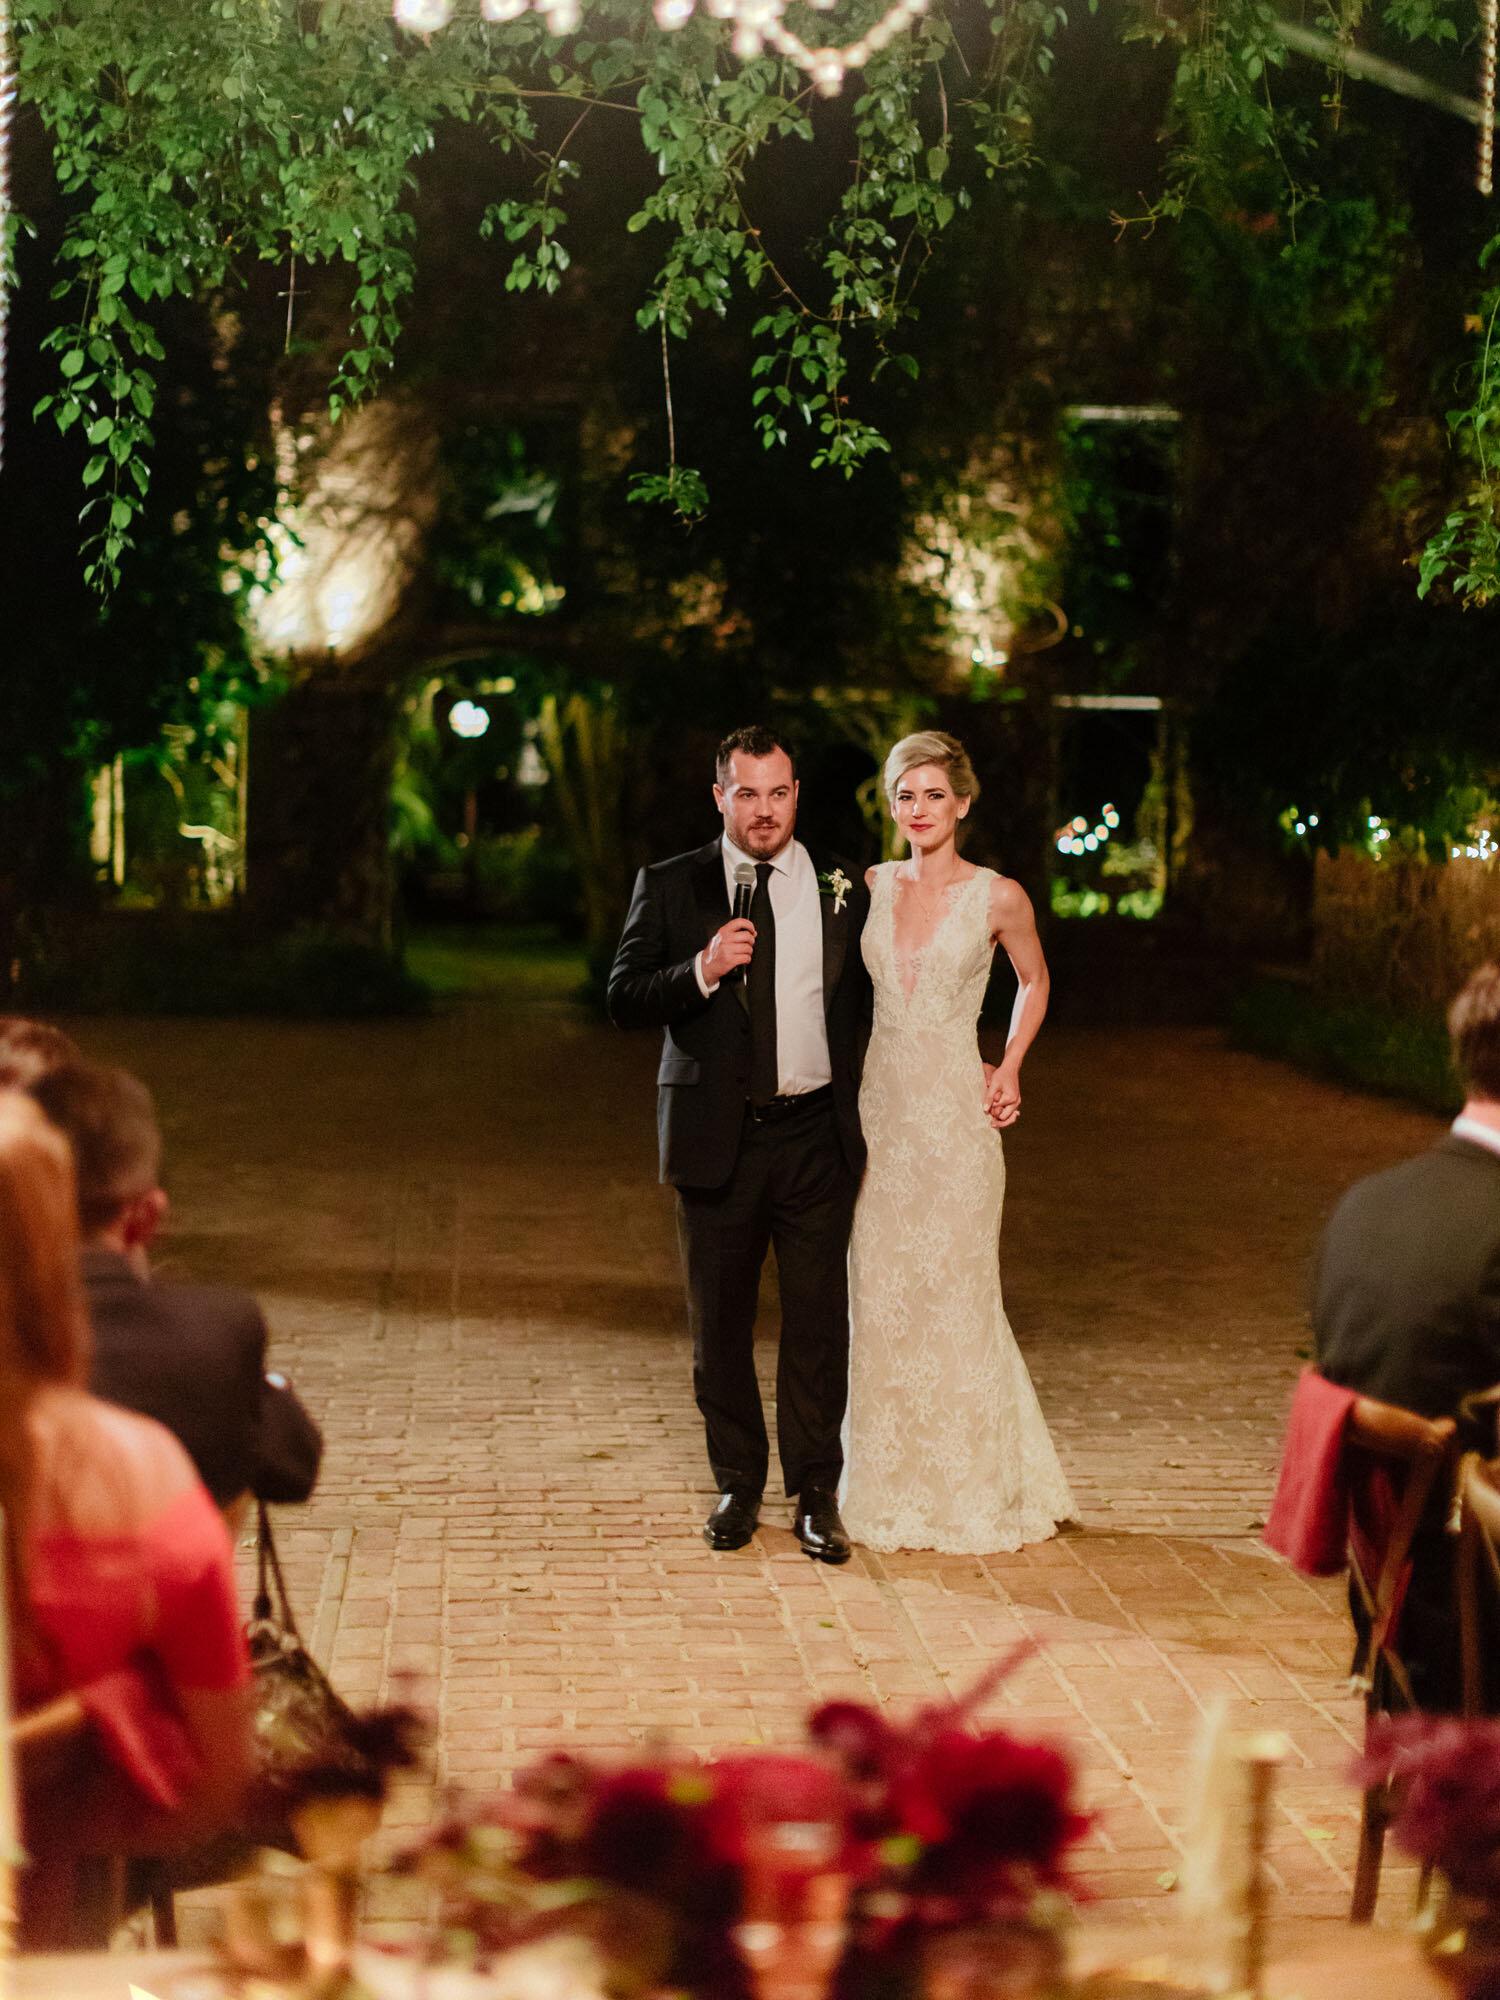 Chris-J-Evans-Maui-Wedding-Kim&Brian4721.jpg